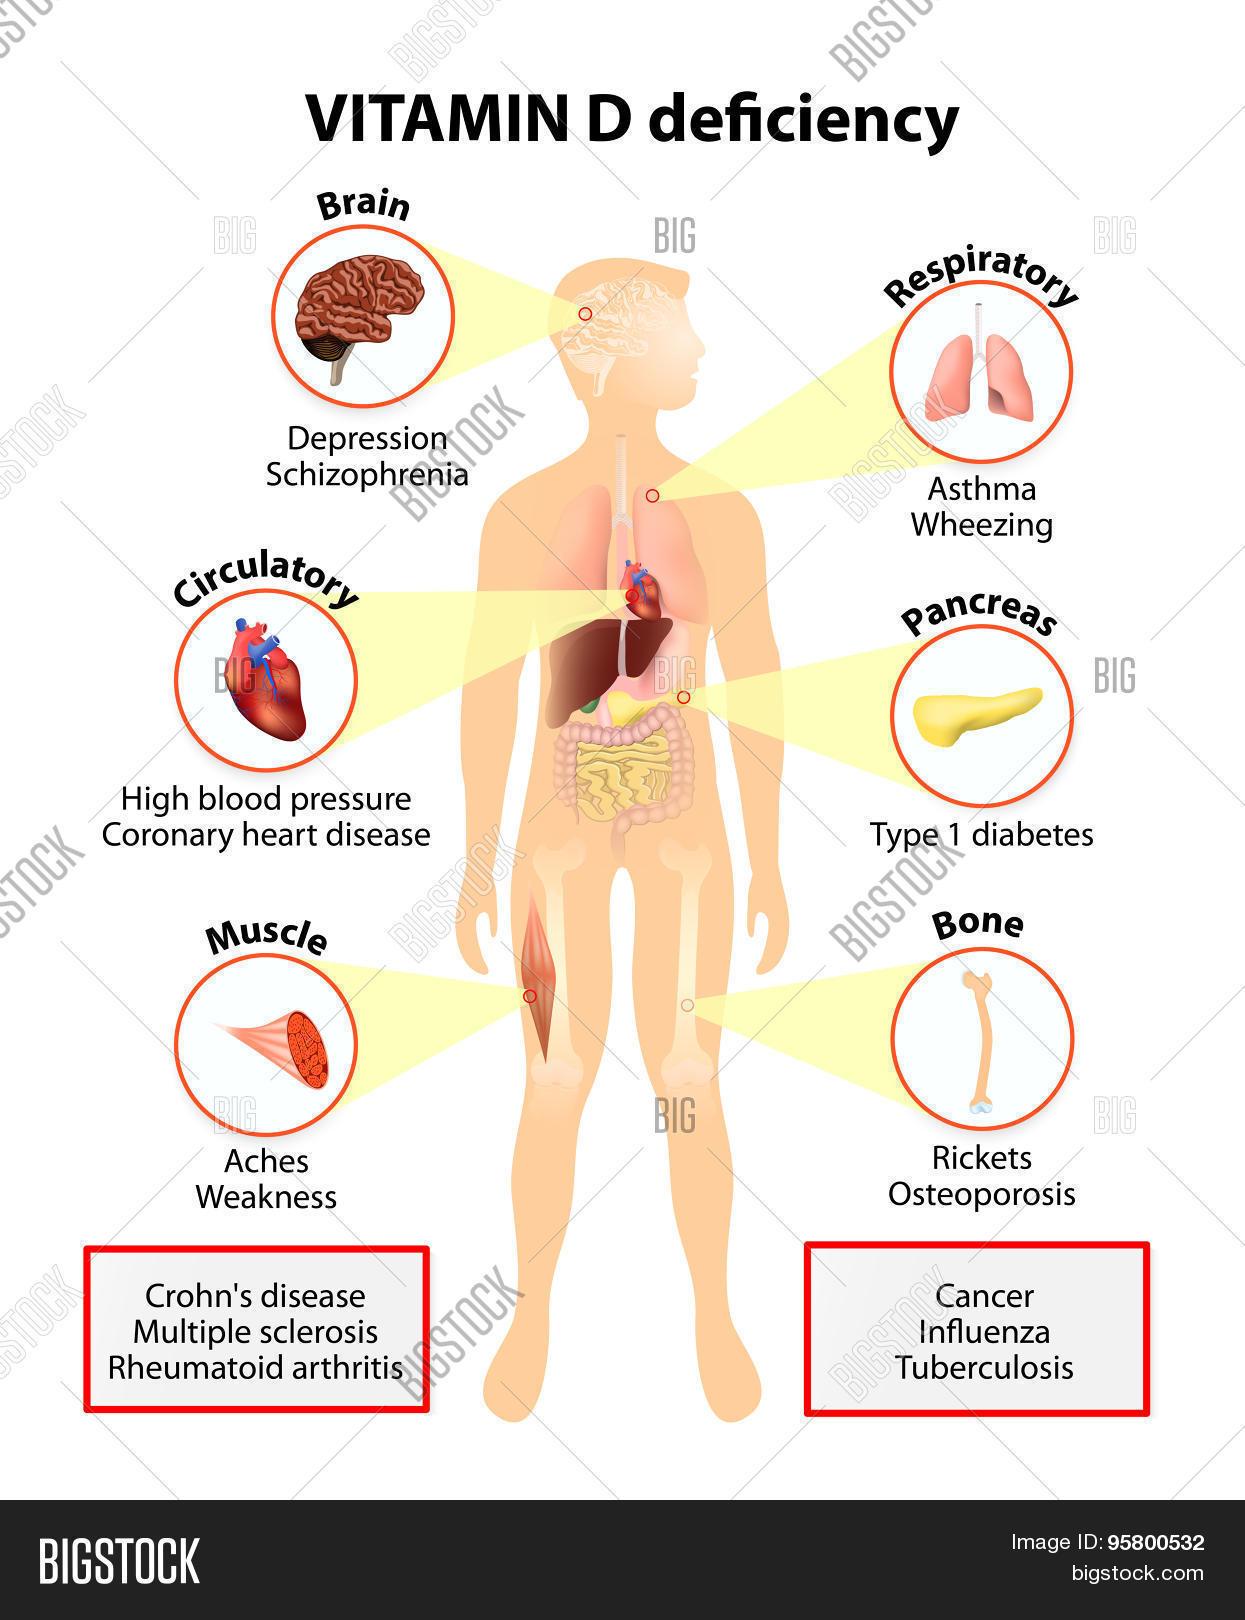 Vitamin D Deficiency Vector & Photo (Free Trial) | Bigstock